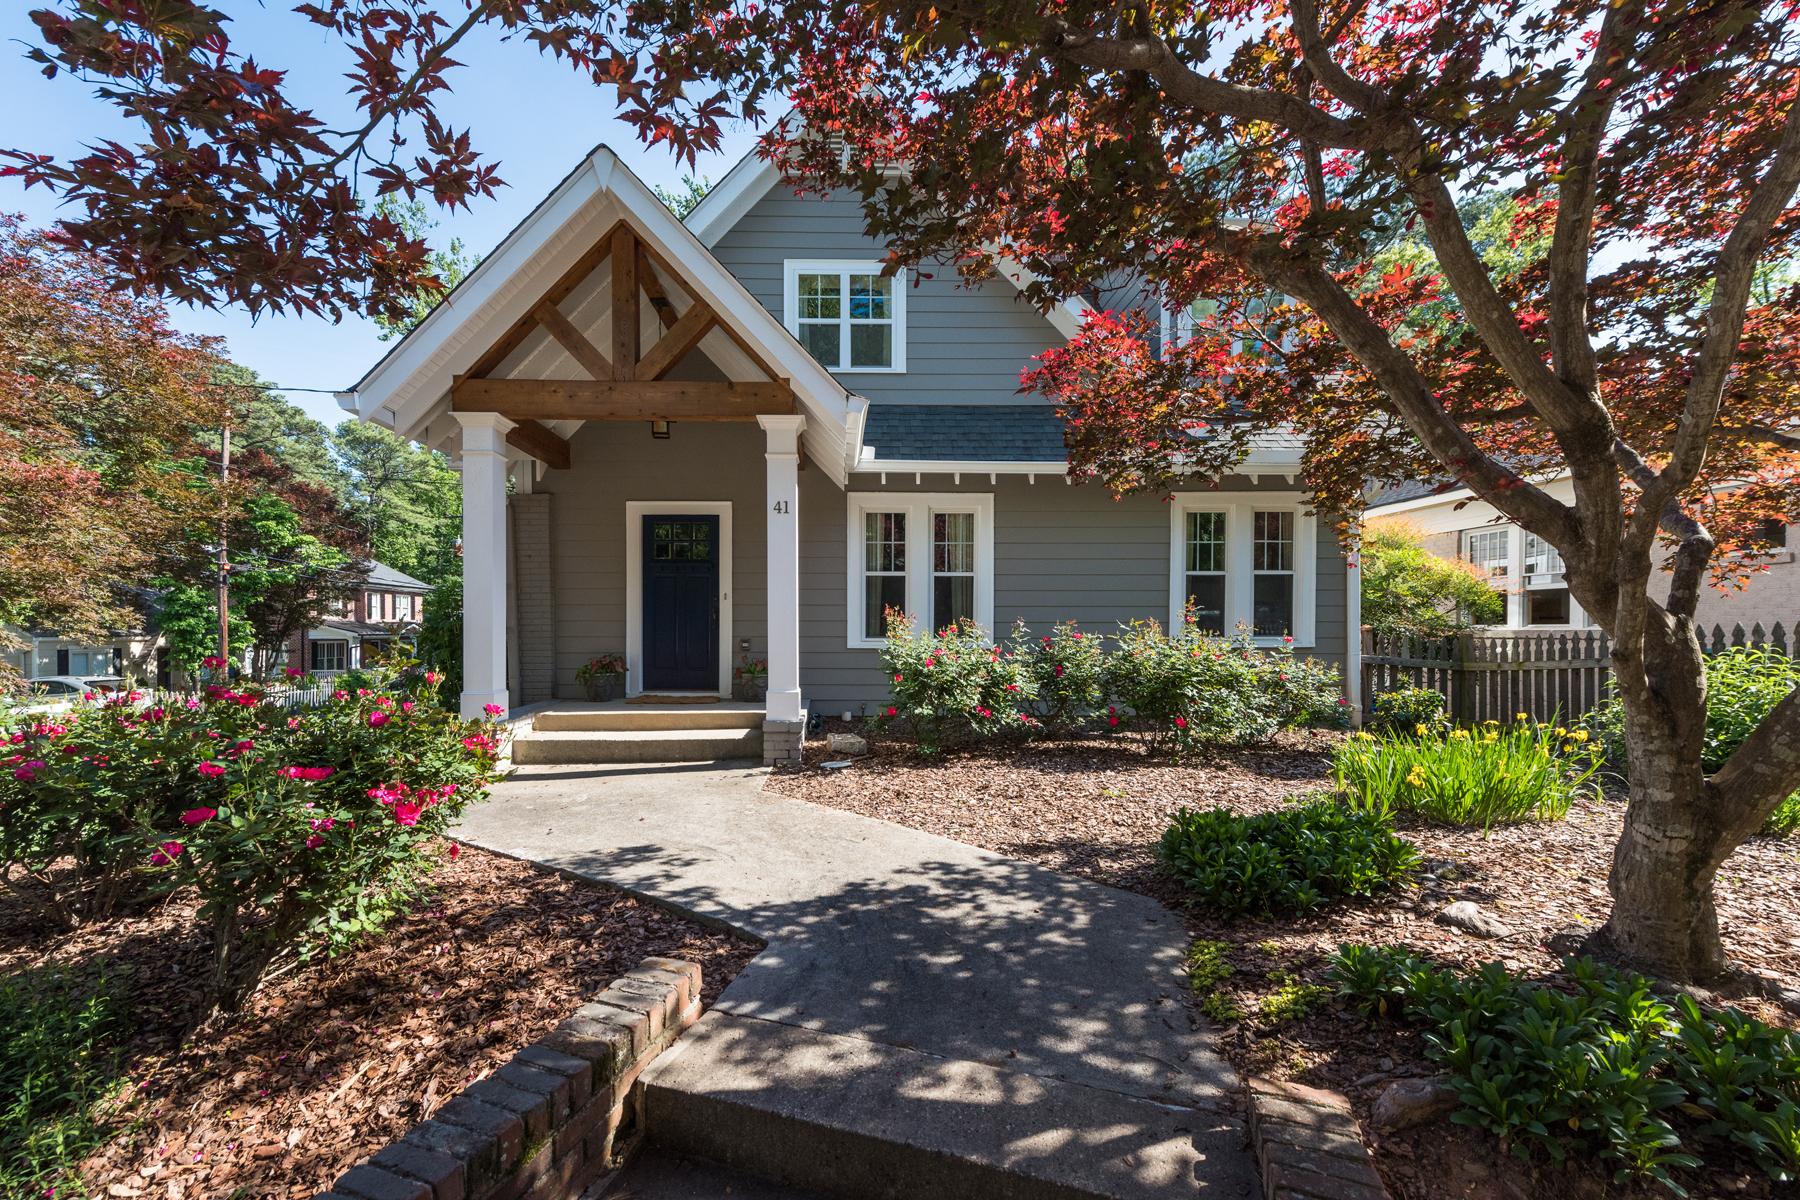 Villa per Vendita alle ore Charming Renovated Home In One Of Buckhead's Most Popular Neighborhoods 41 East Drive NE Peachtree Hills, Atlanta, Georgia, 30305 Stati Uniti